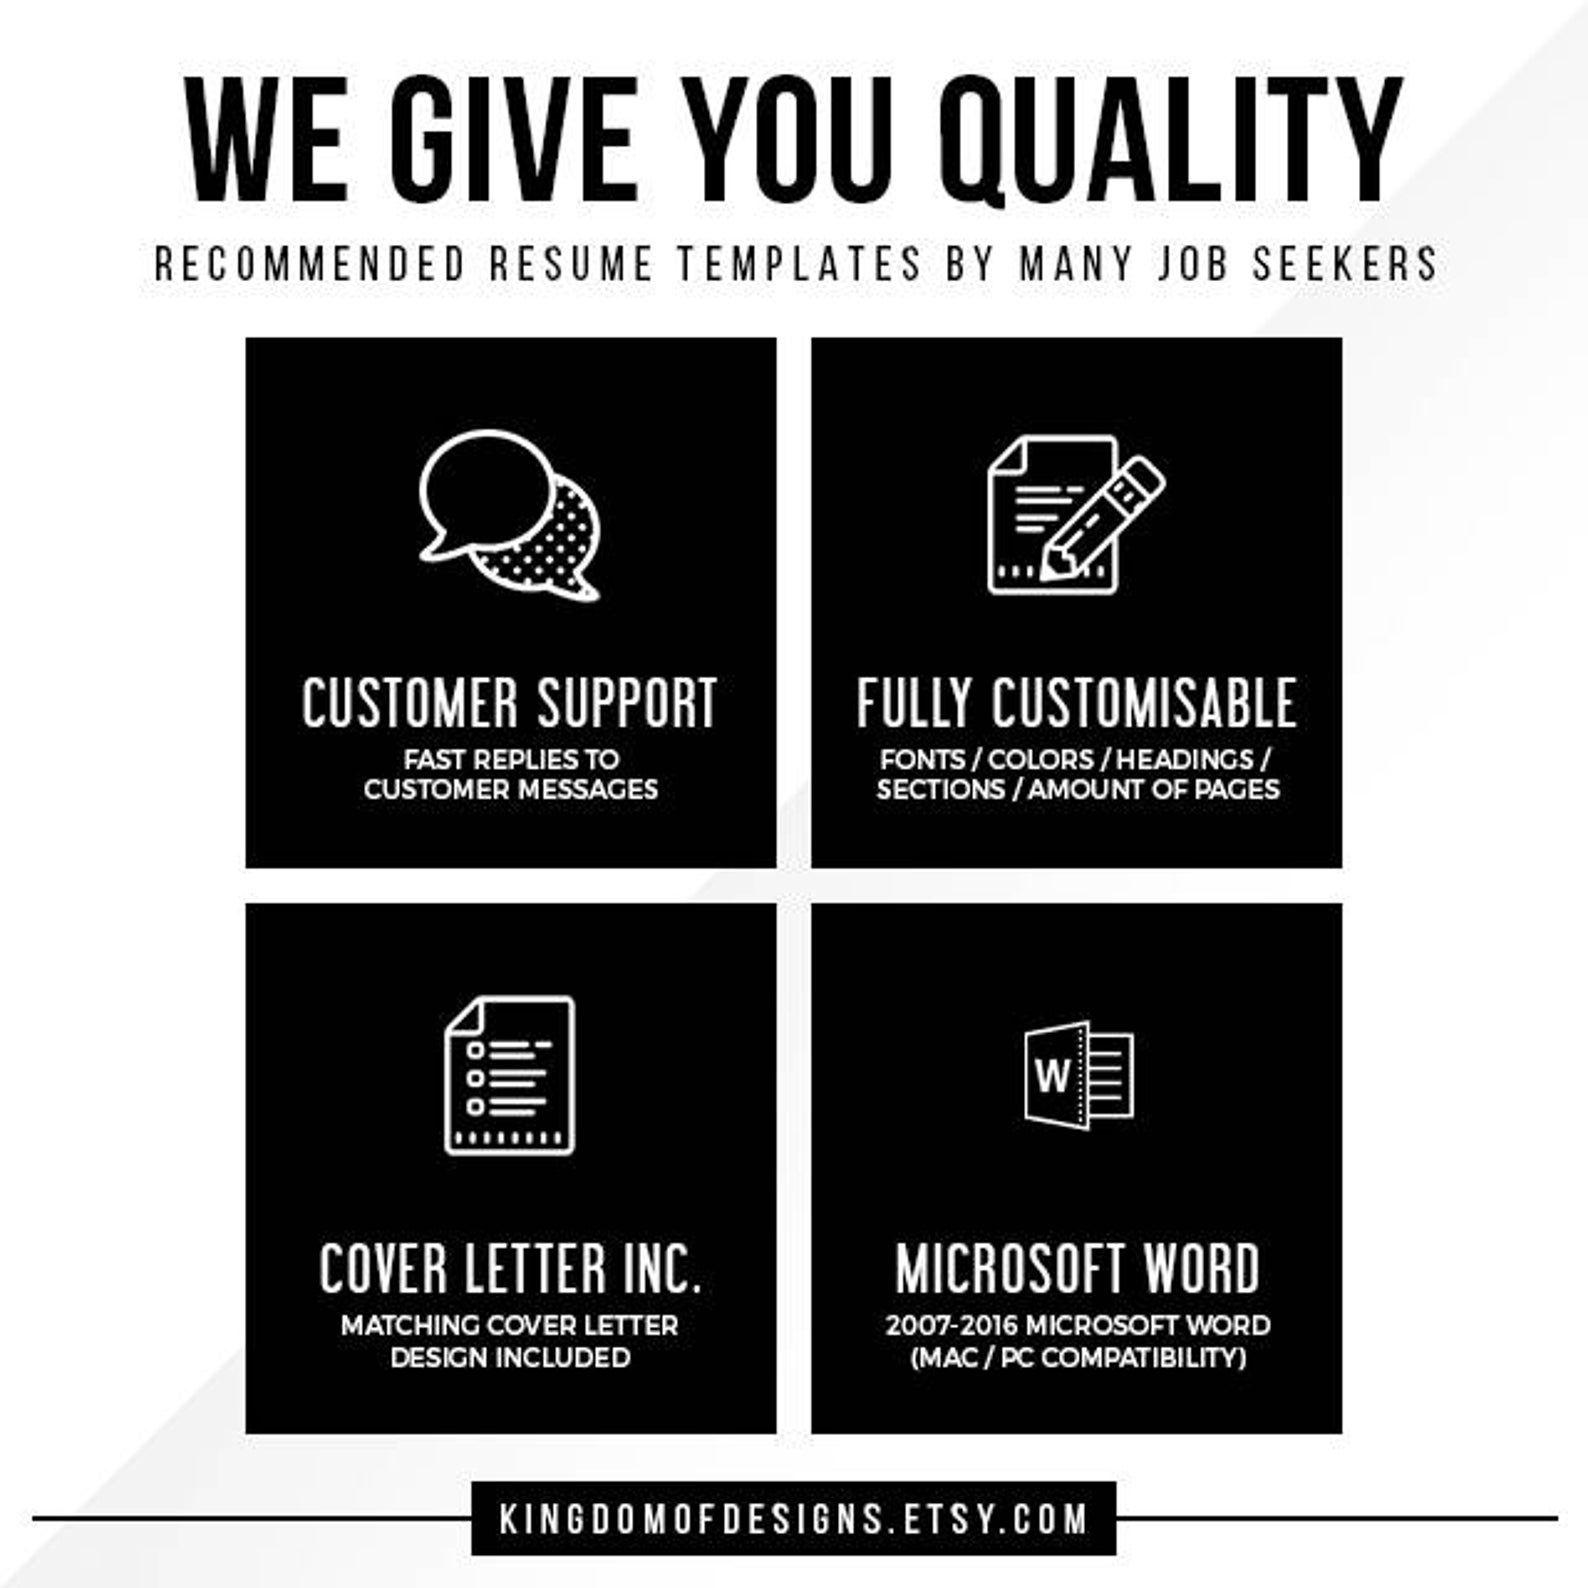 resume for microsoft word - minimal resume template